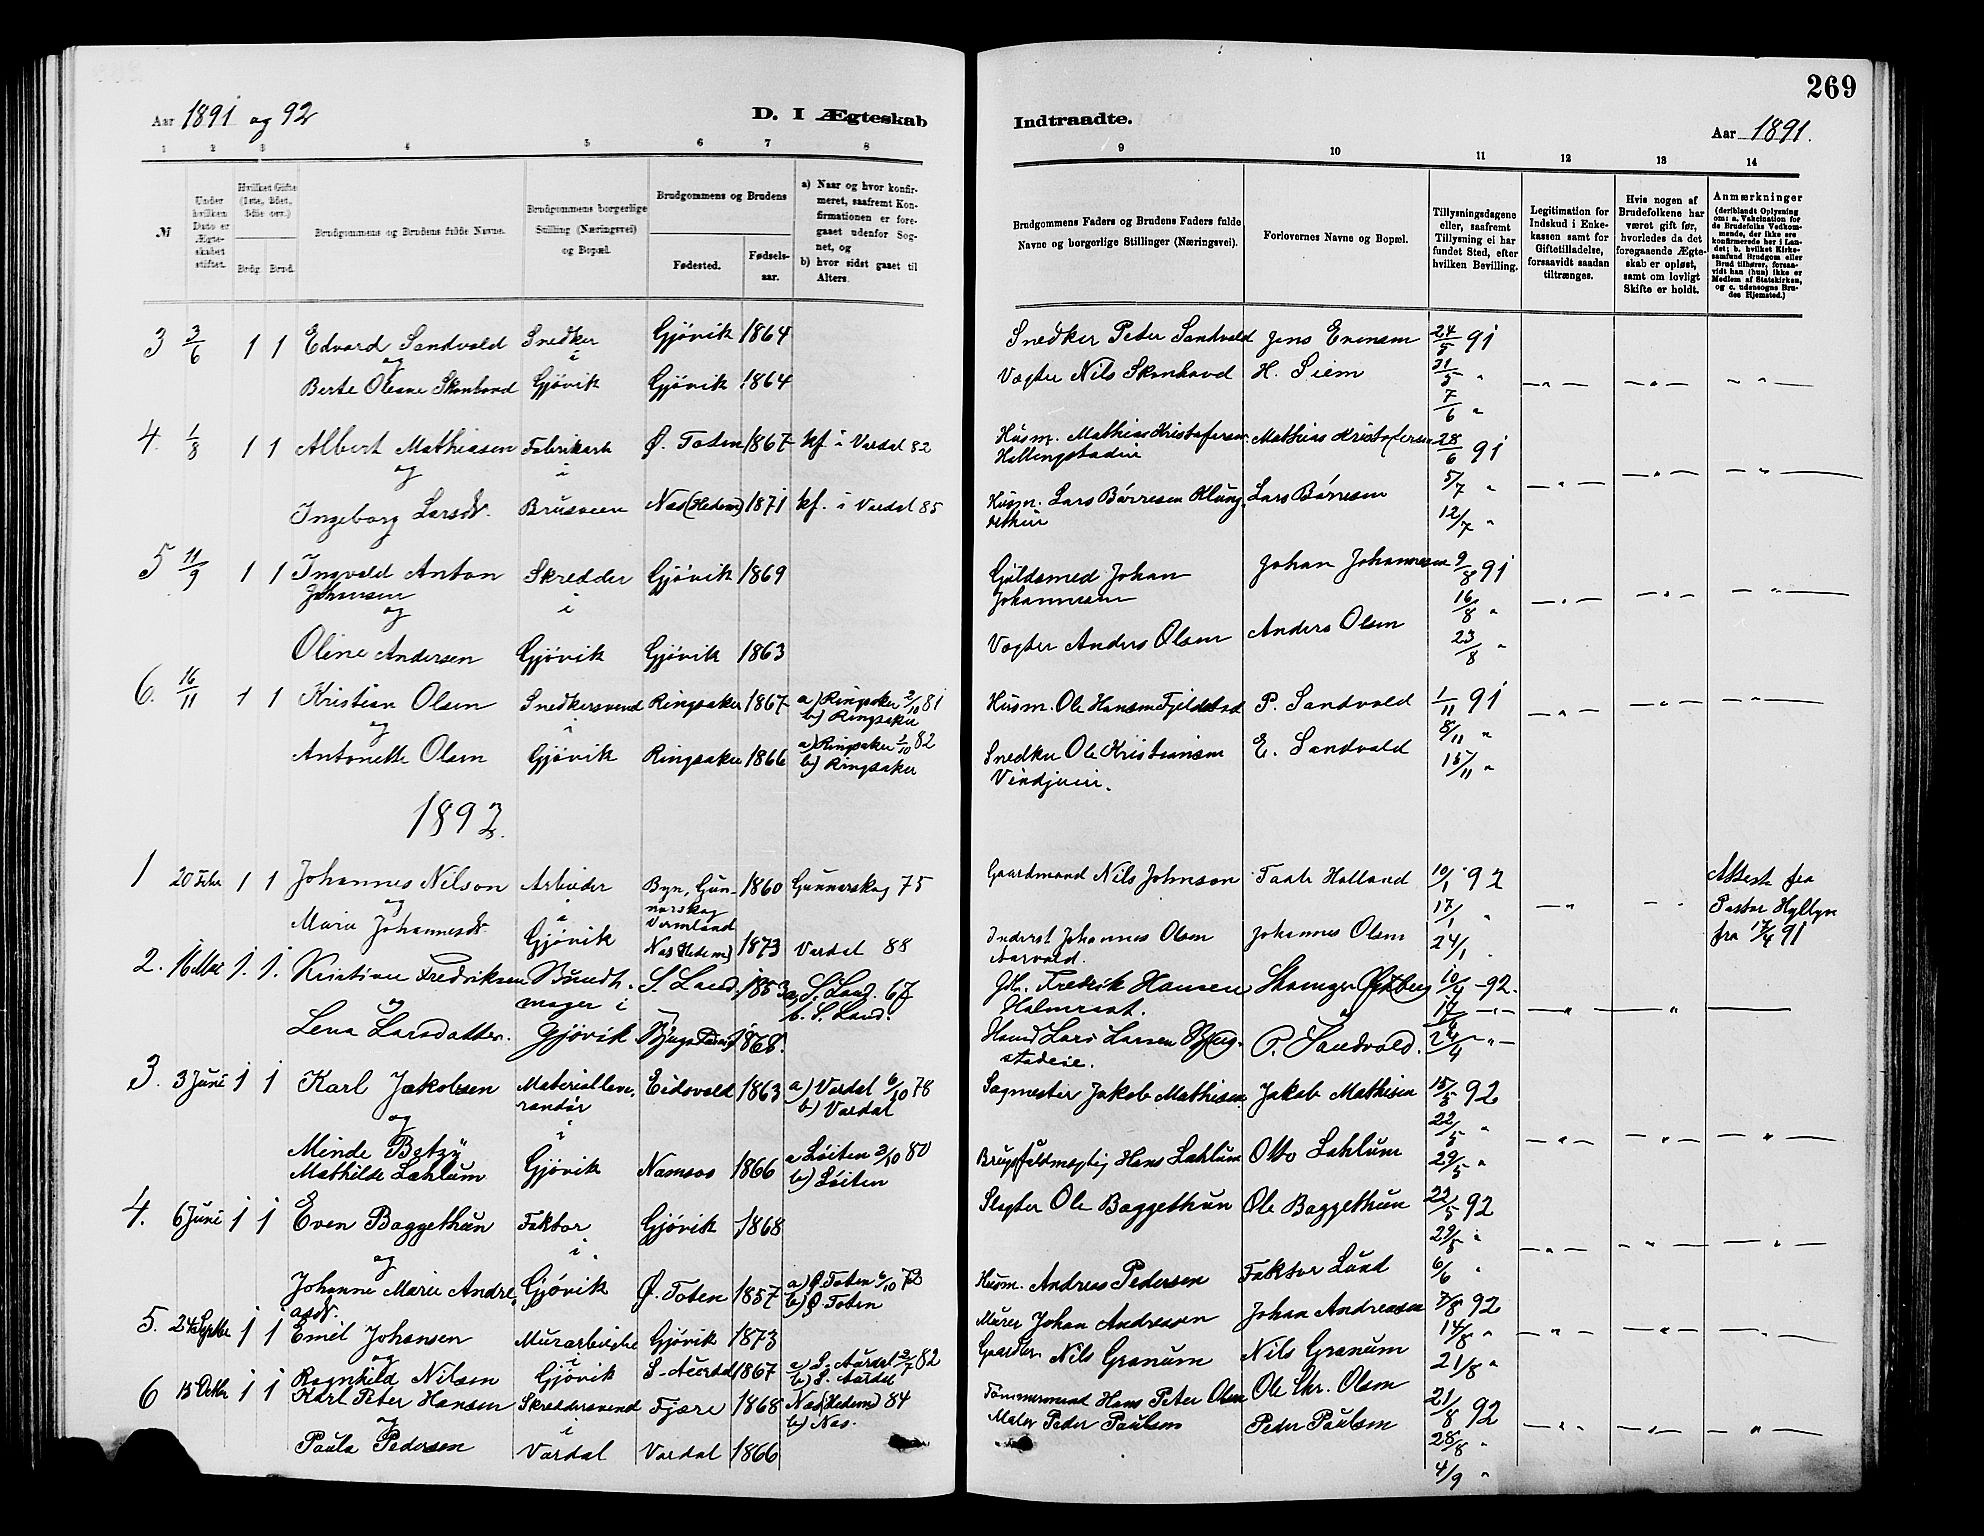 SAH, Vardal prestekontor, H/Ha/Hab/L0007: Klokkerbok nr. 7 /2, 1881-1895, s. 269